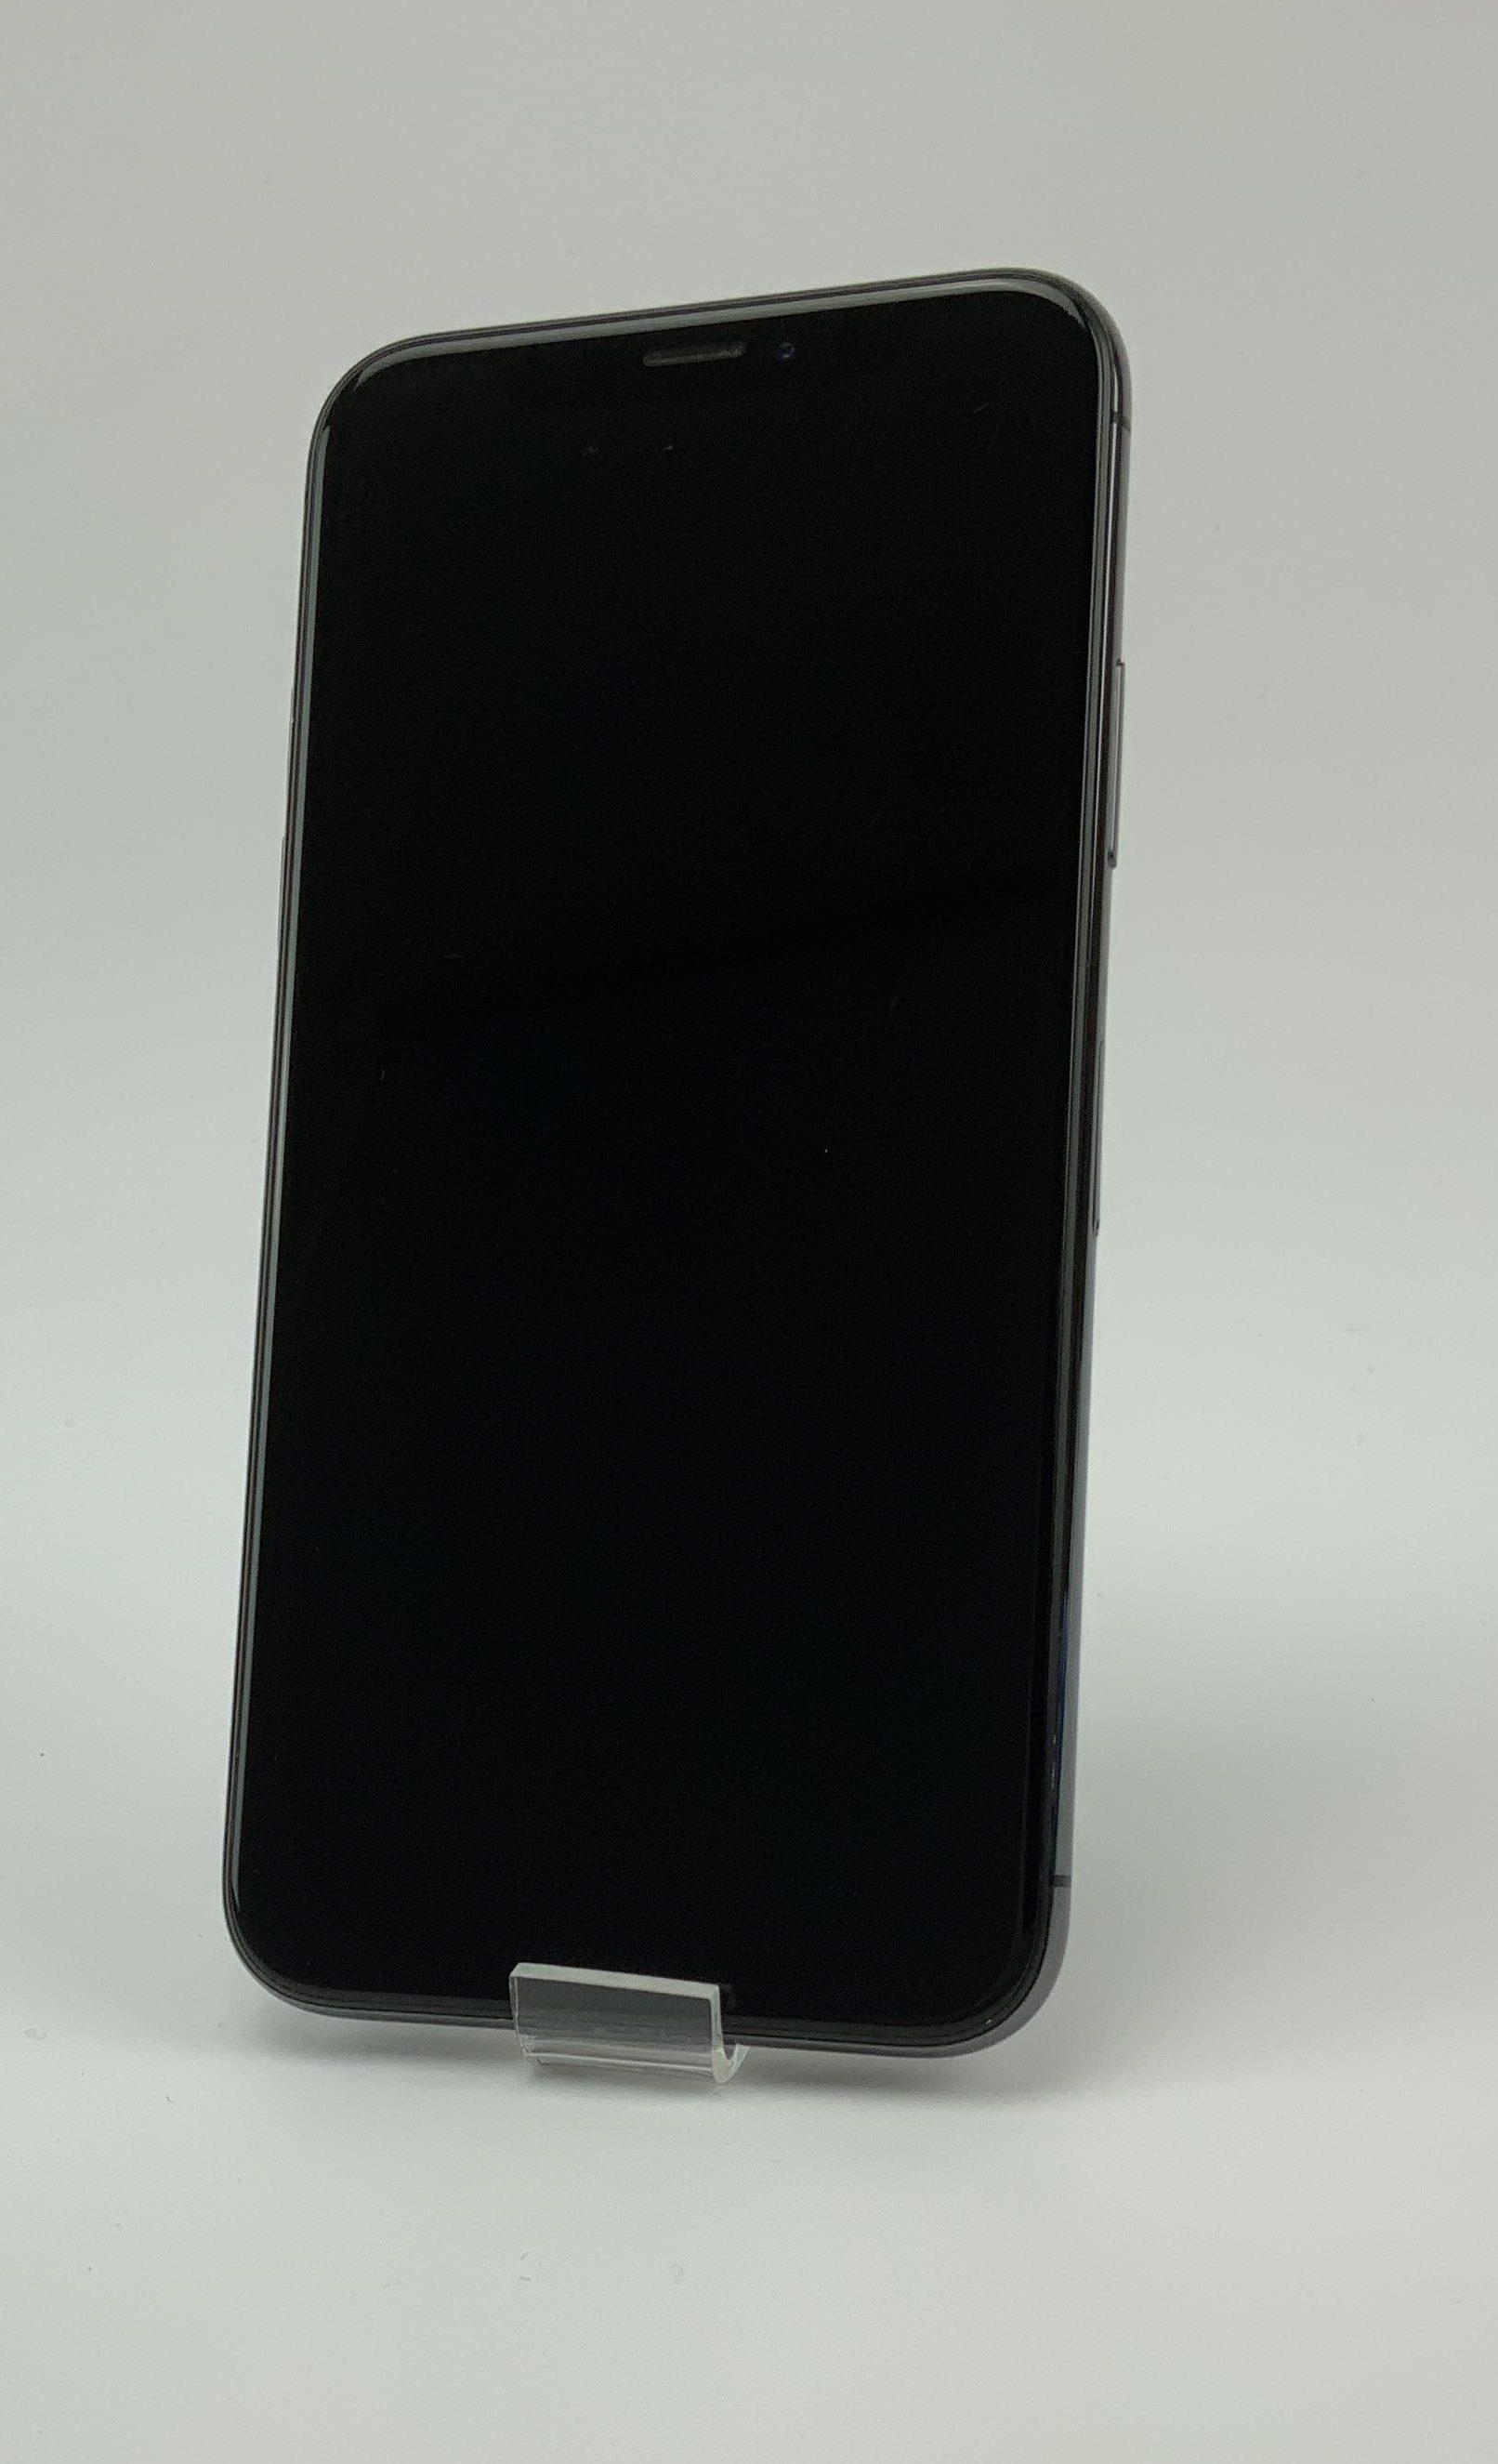 iPhone X 256GB, 256GB, Space Gray, bild 1